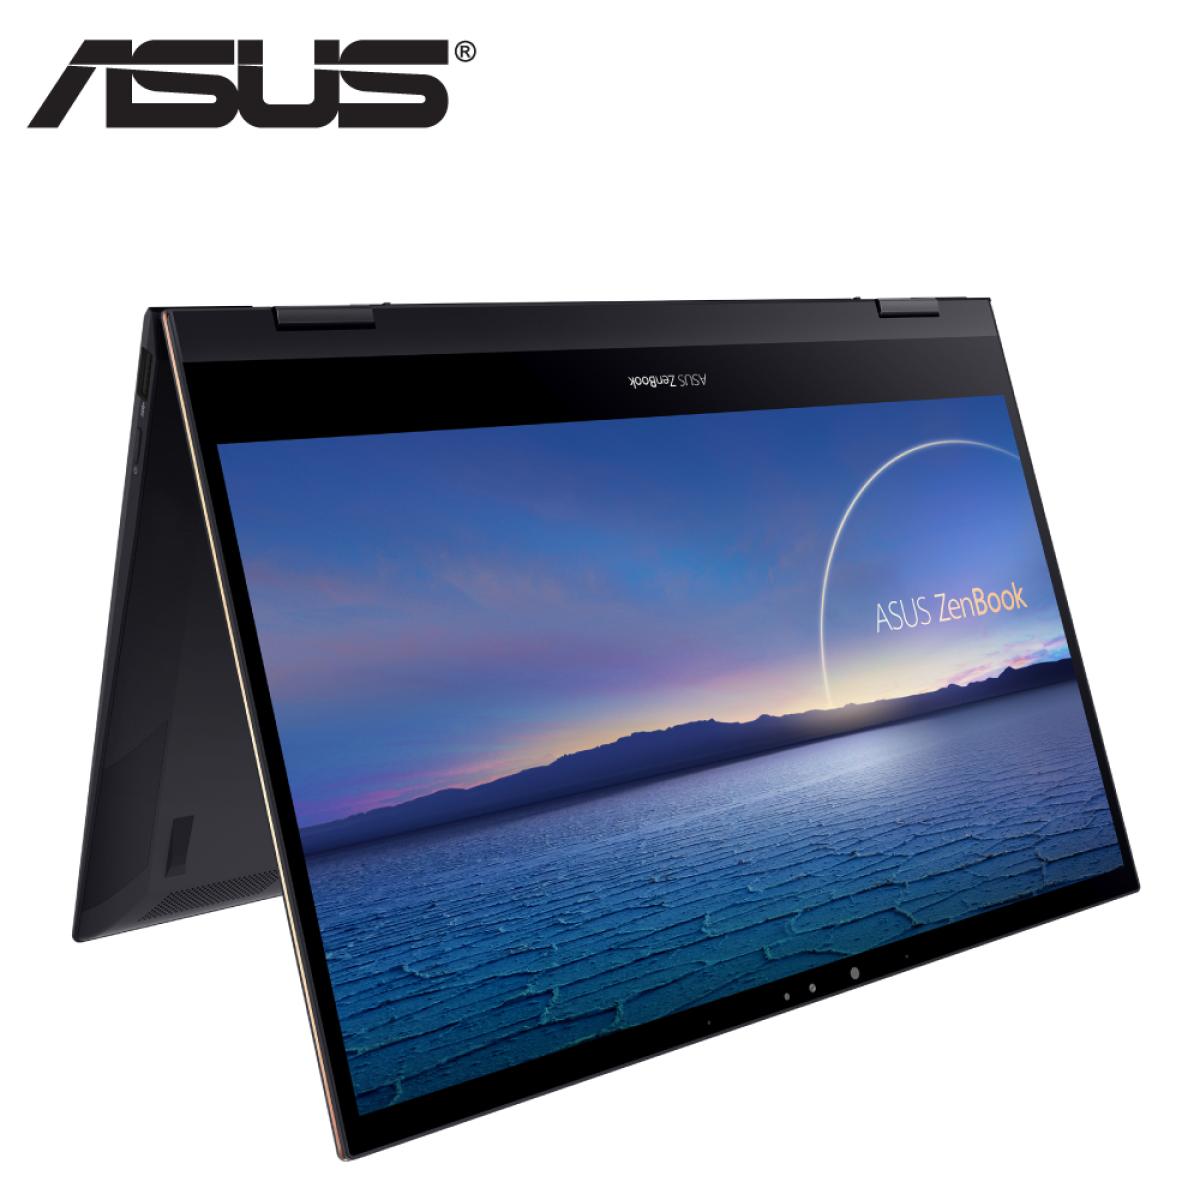 Asus ZenBook Flip S13 UX371E-AHL283TS 13.3'' UHD Touch Laptop Jade Black ( i7-1165G7, 16GB, 1TB SSD, Intel, W10, HS ) Laptop